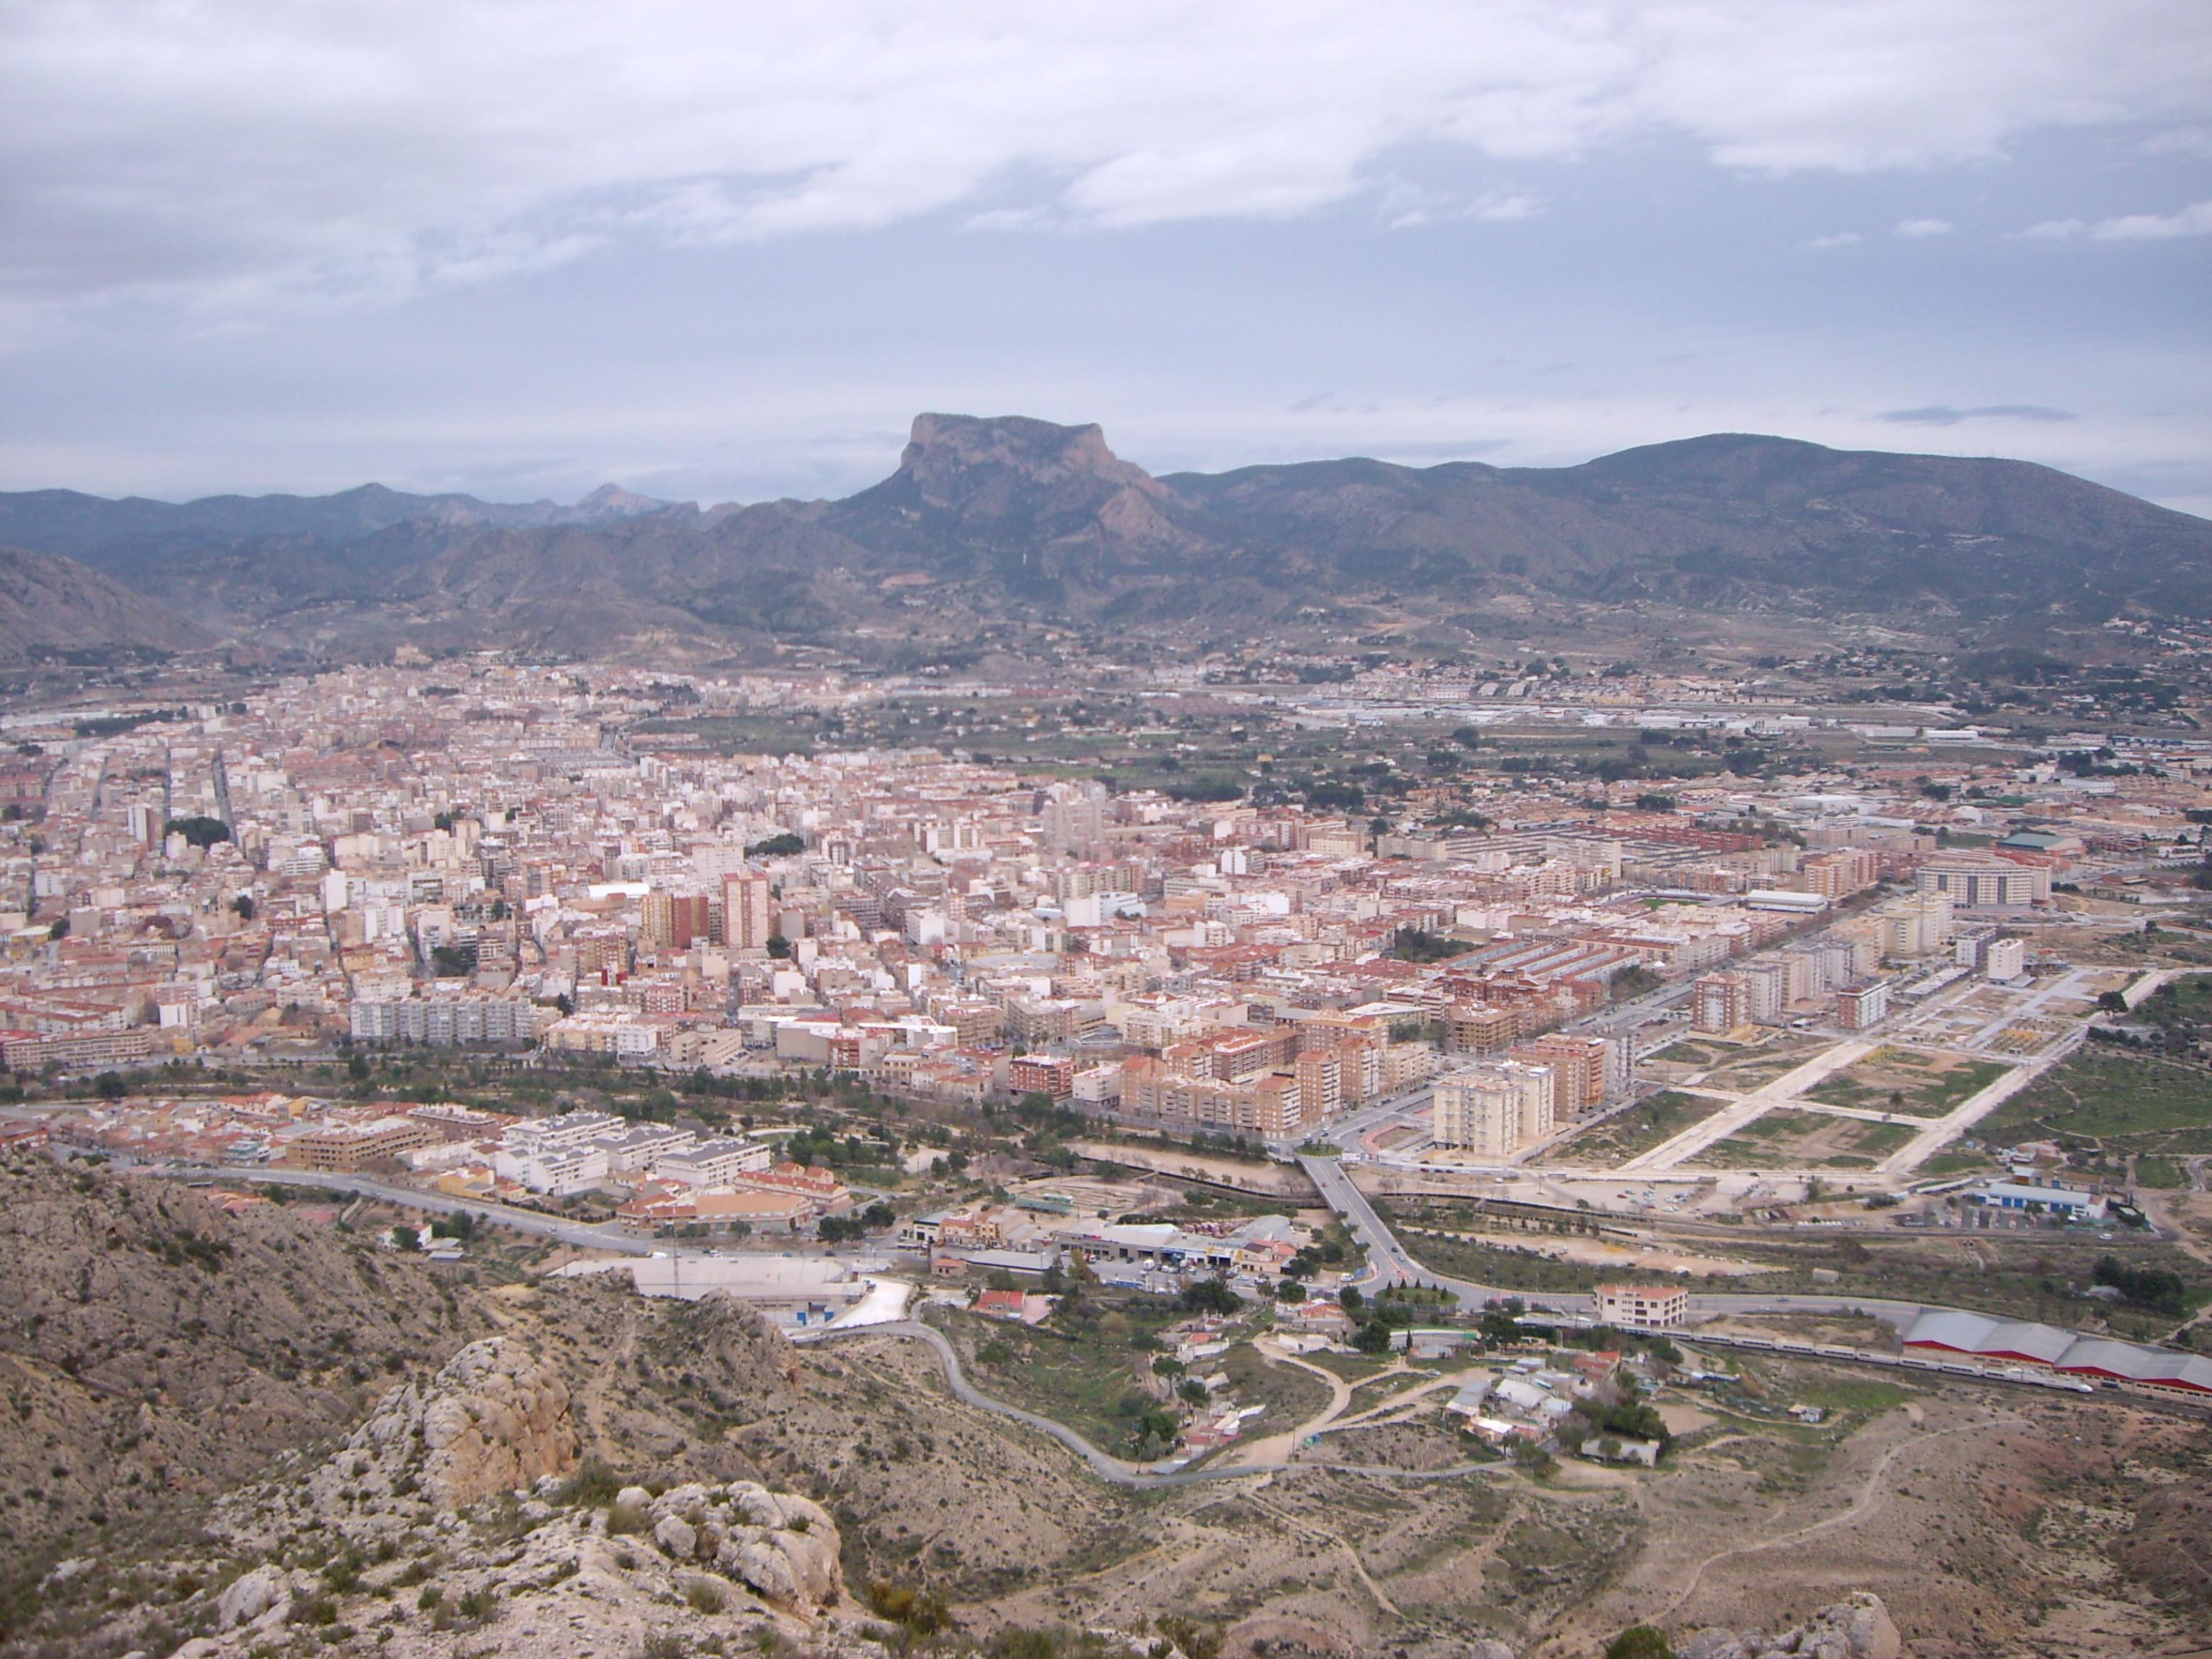 Vista de Elda-Petrel